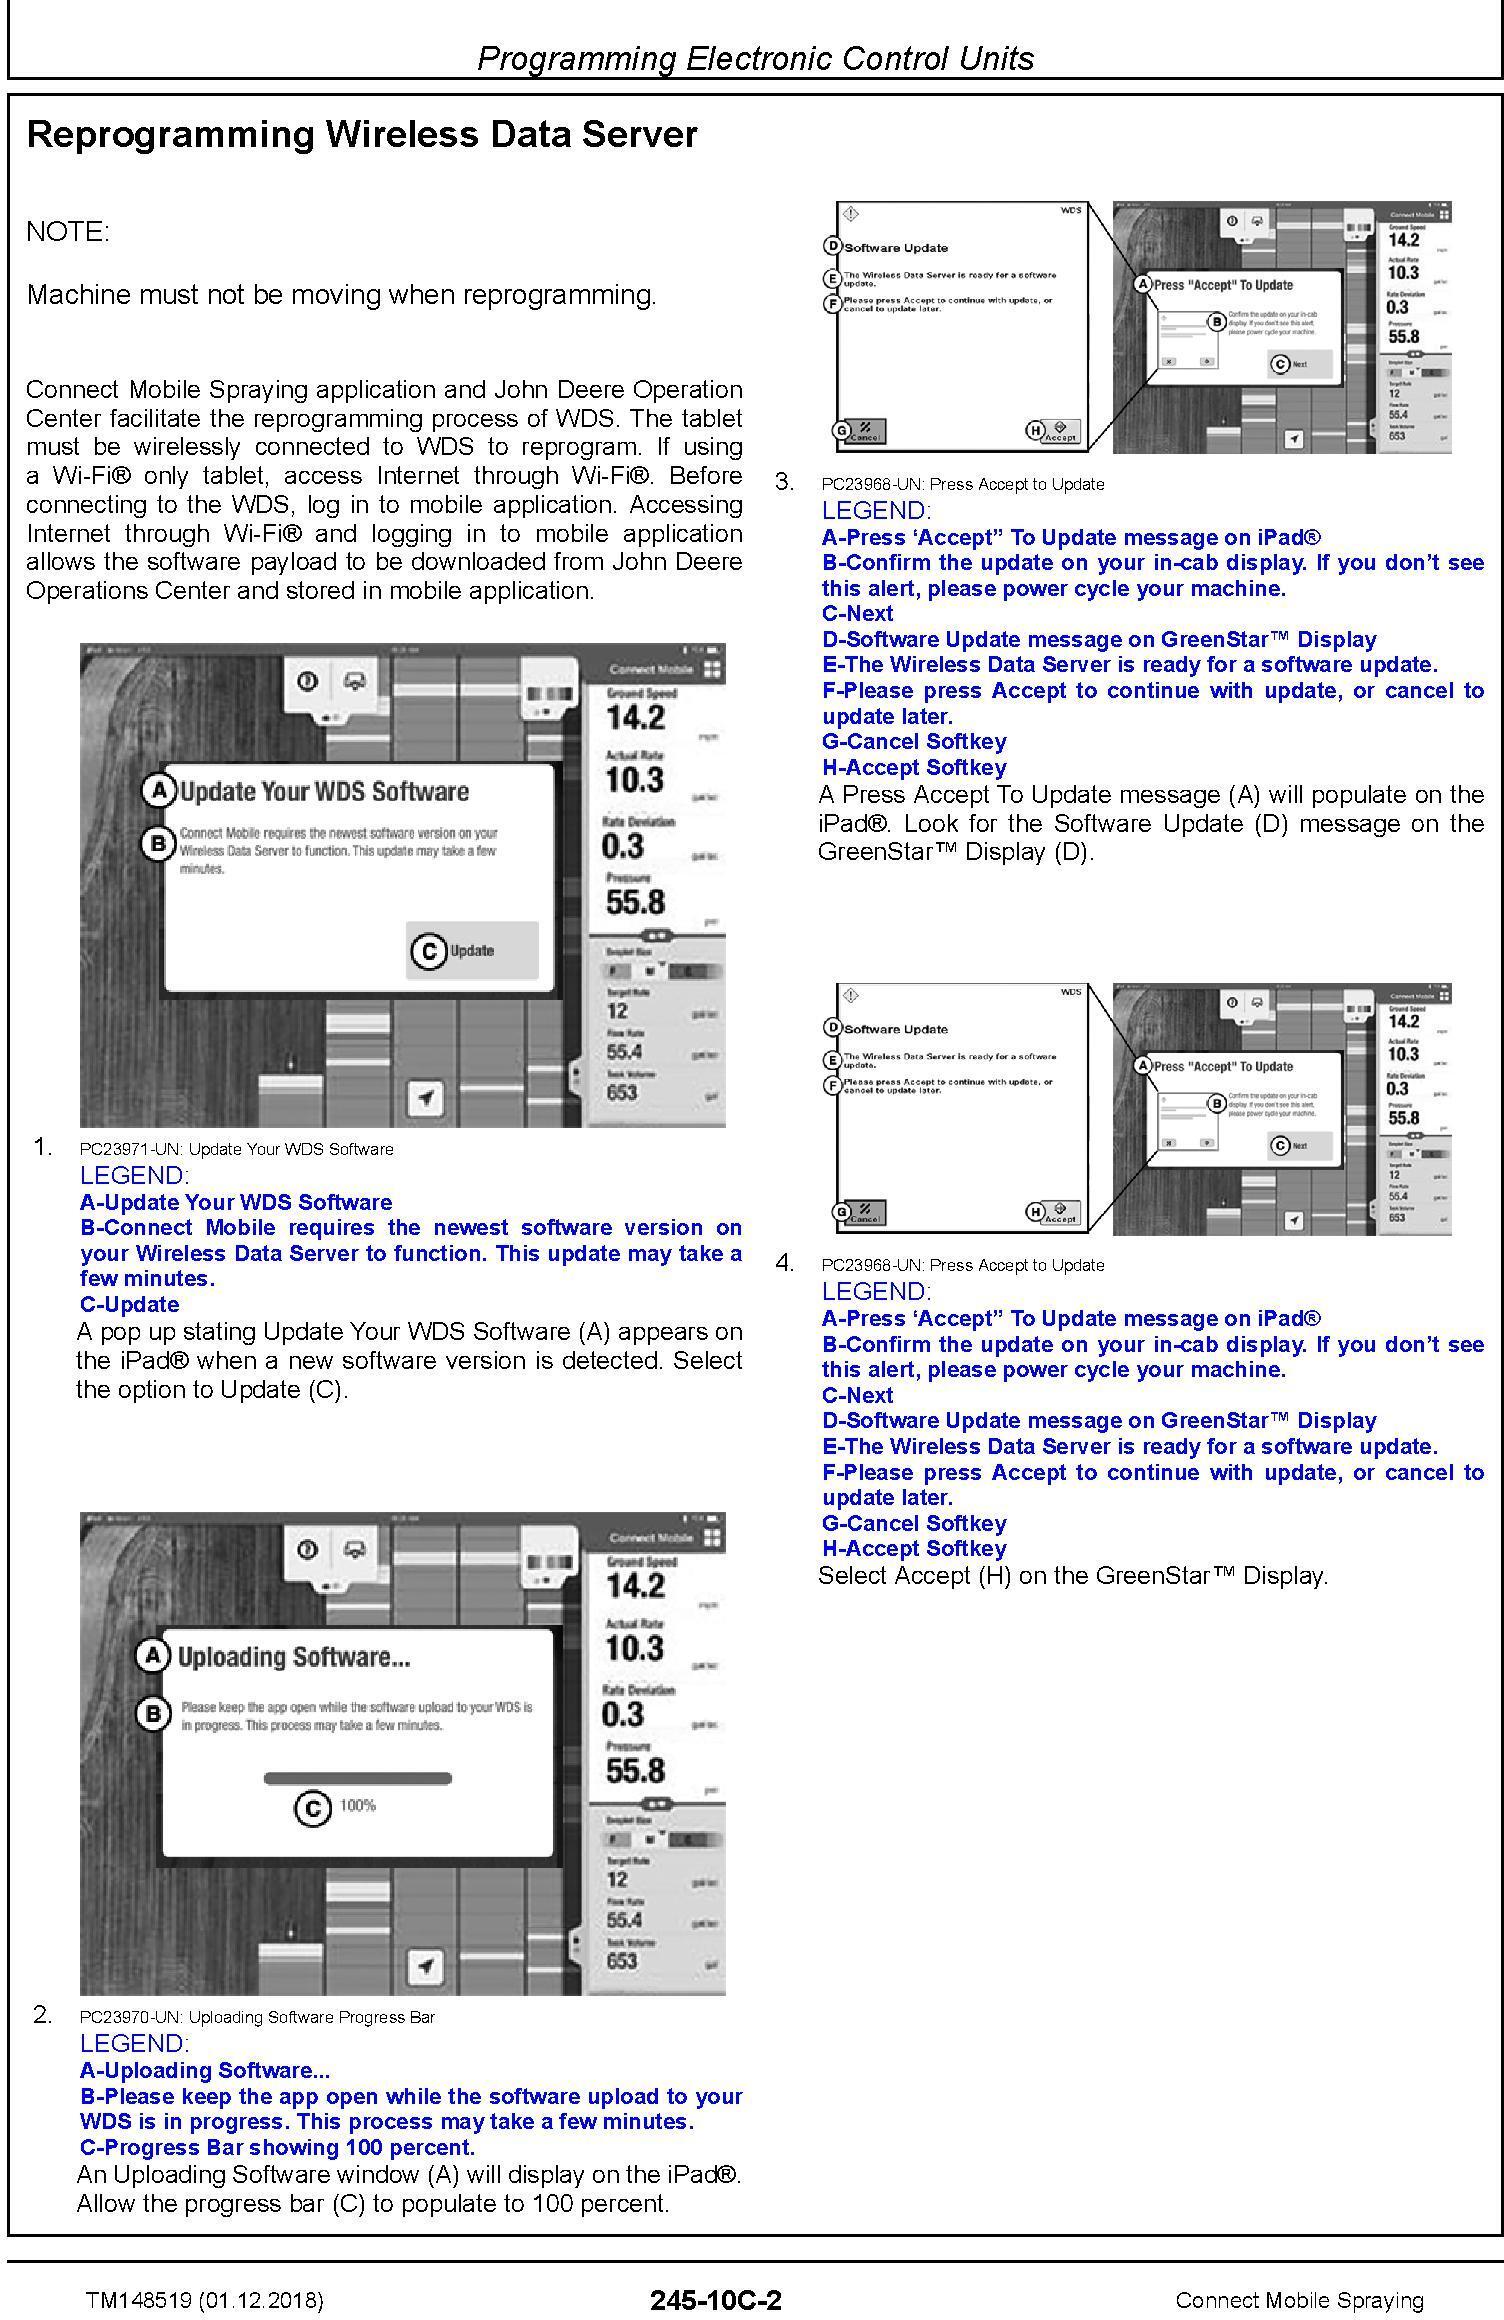 John Deere Connect Mobile Spraying Repair Technical Service Manual (TM148519) - 2